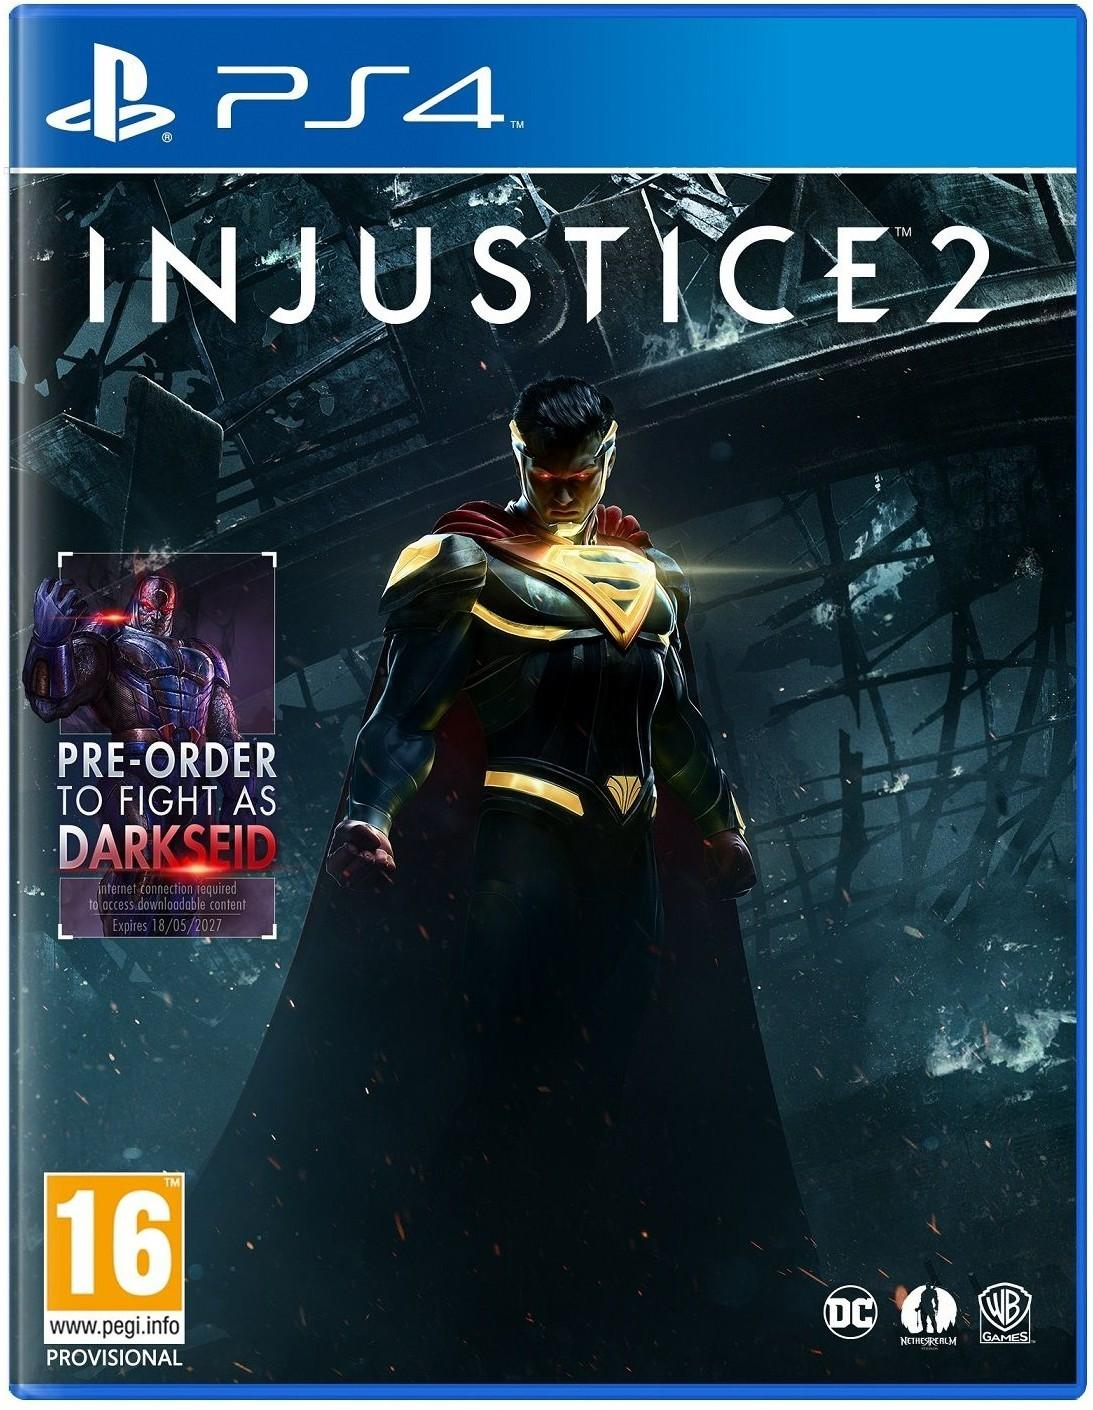 Premiera Injustice 2 PL PS4